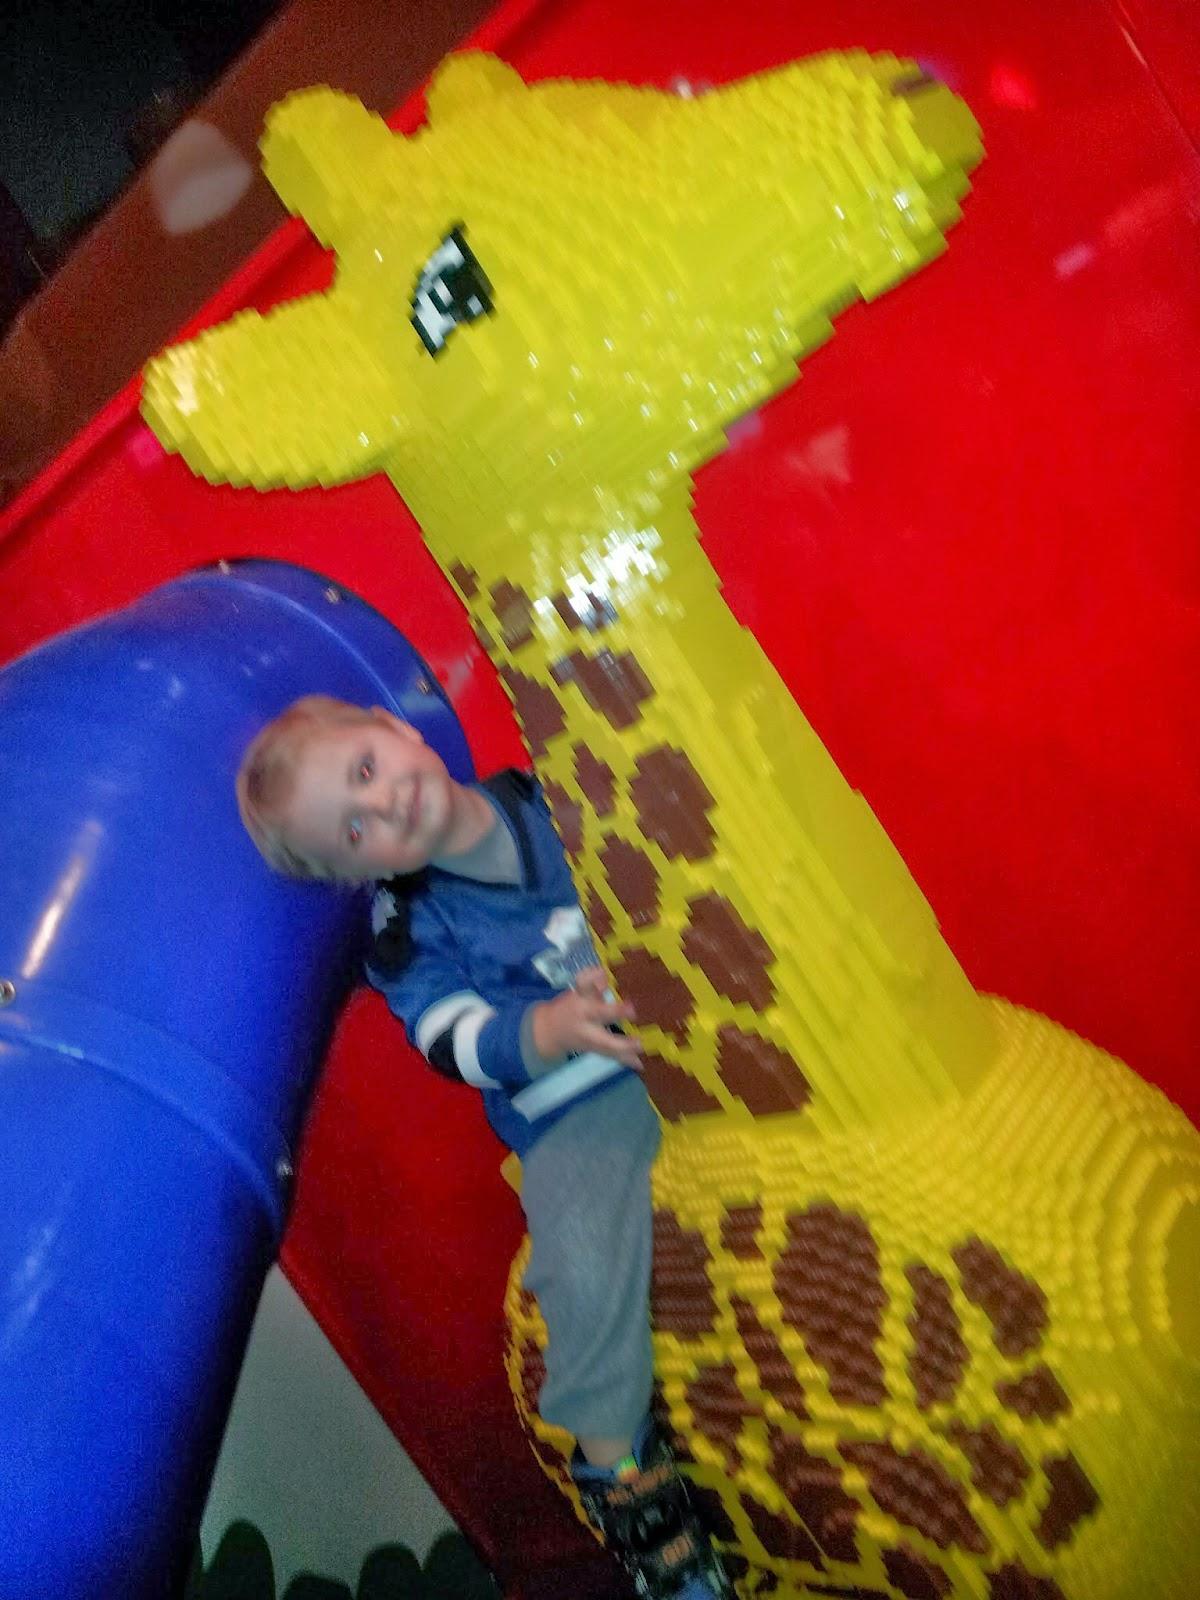 Legoland Lego giraffe, kids activities, Toronto